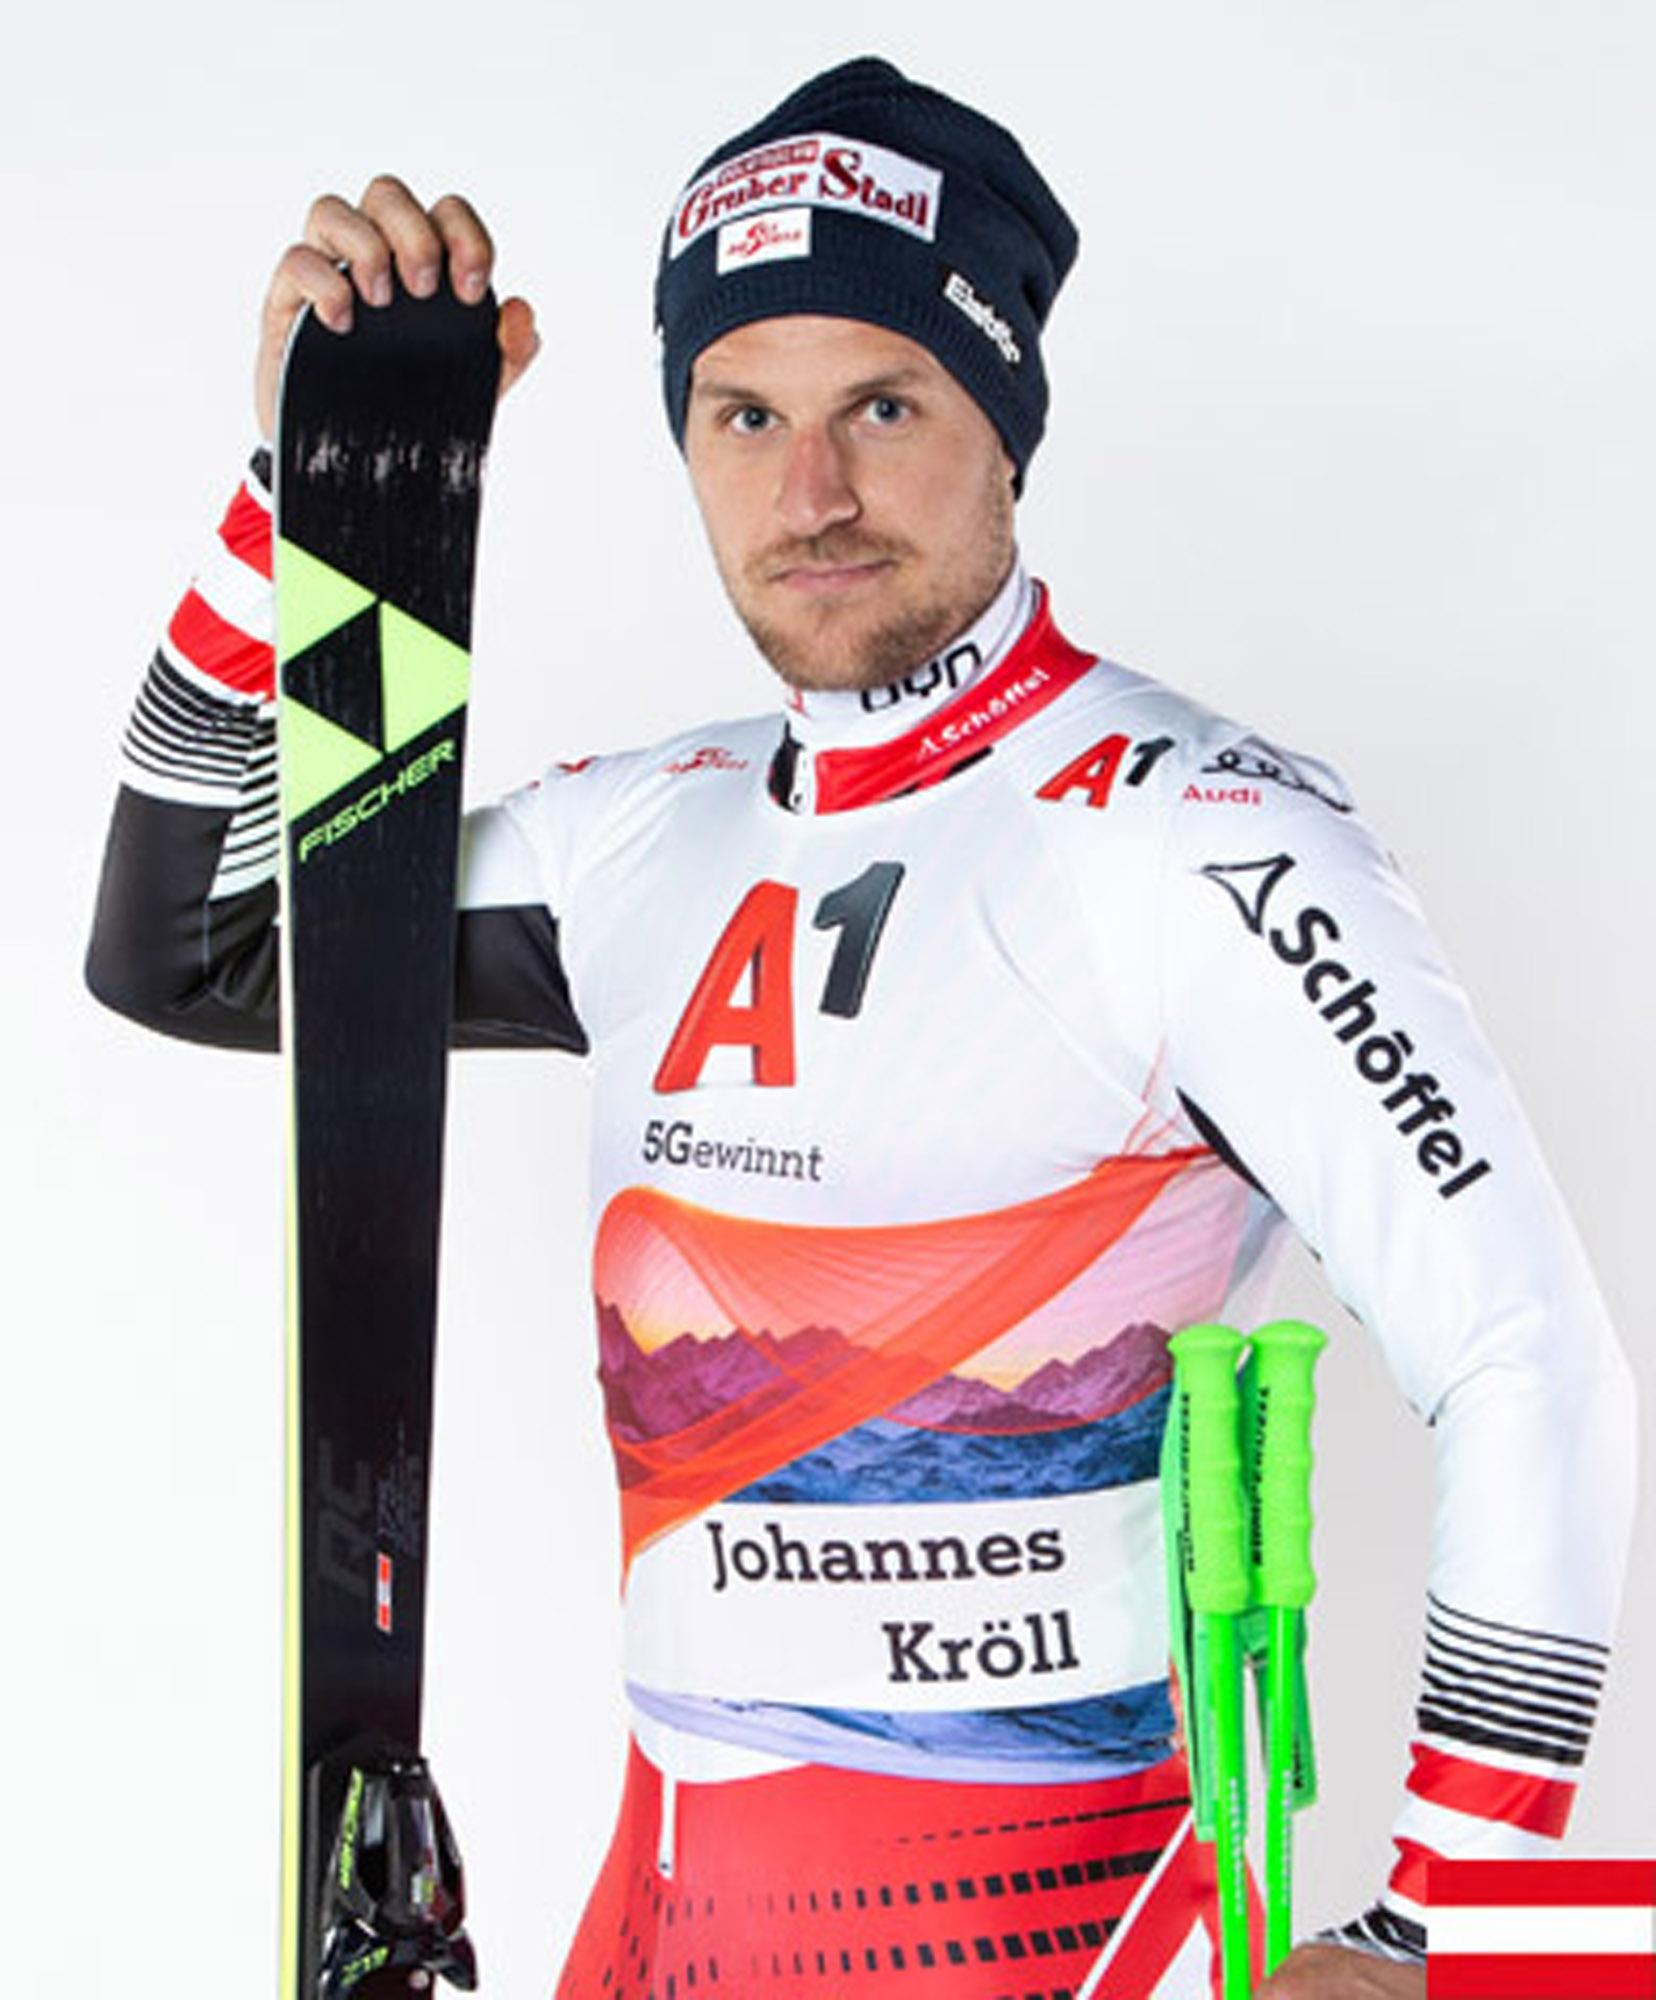 Johannes Kröll